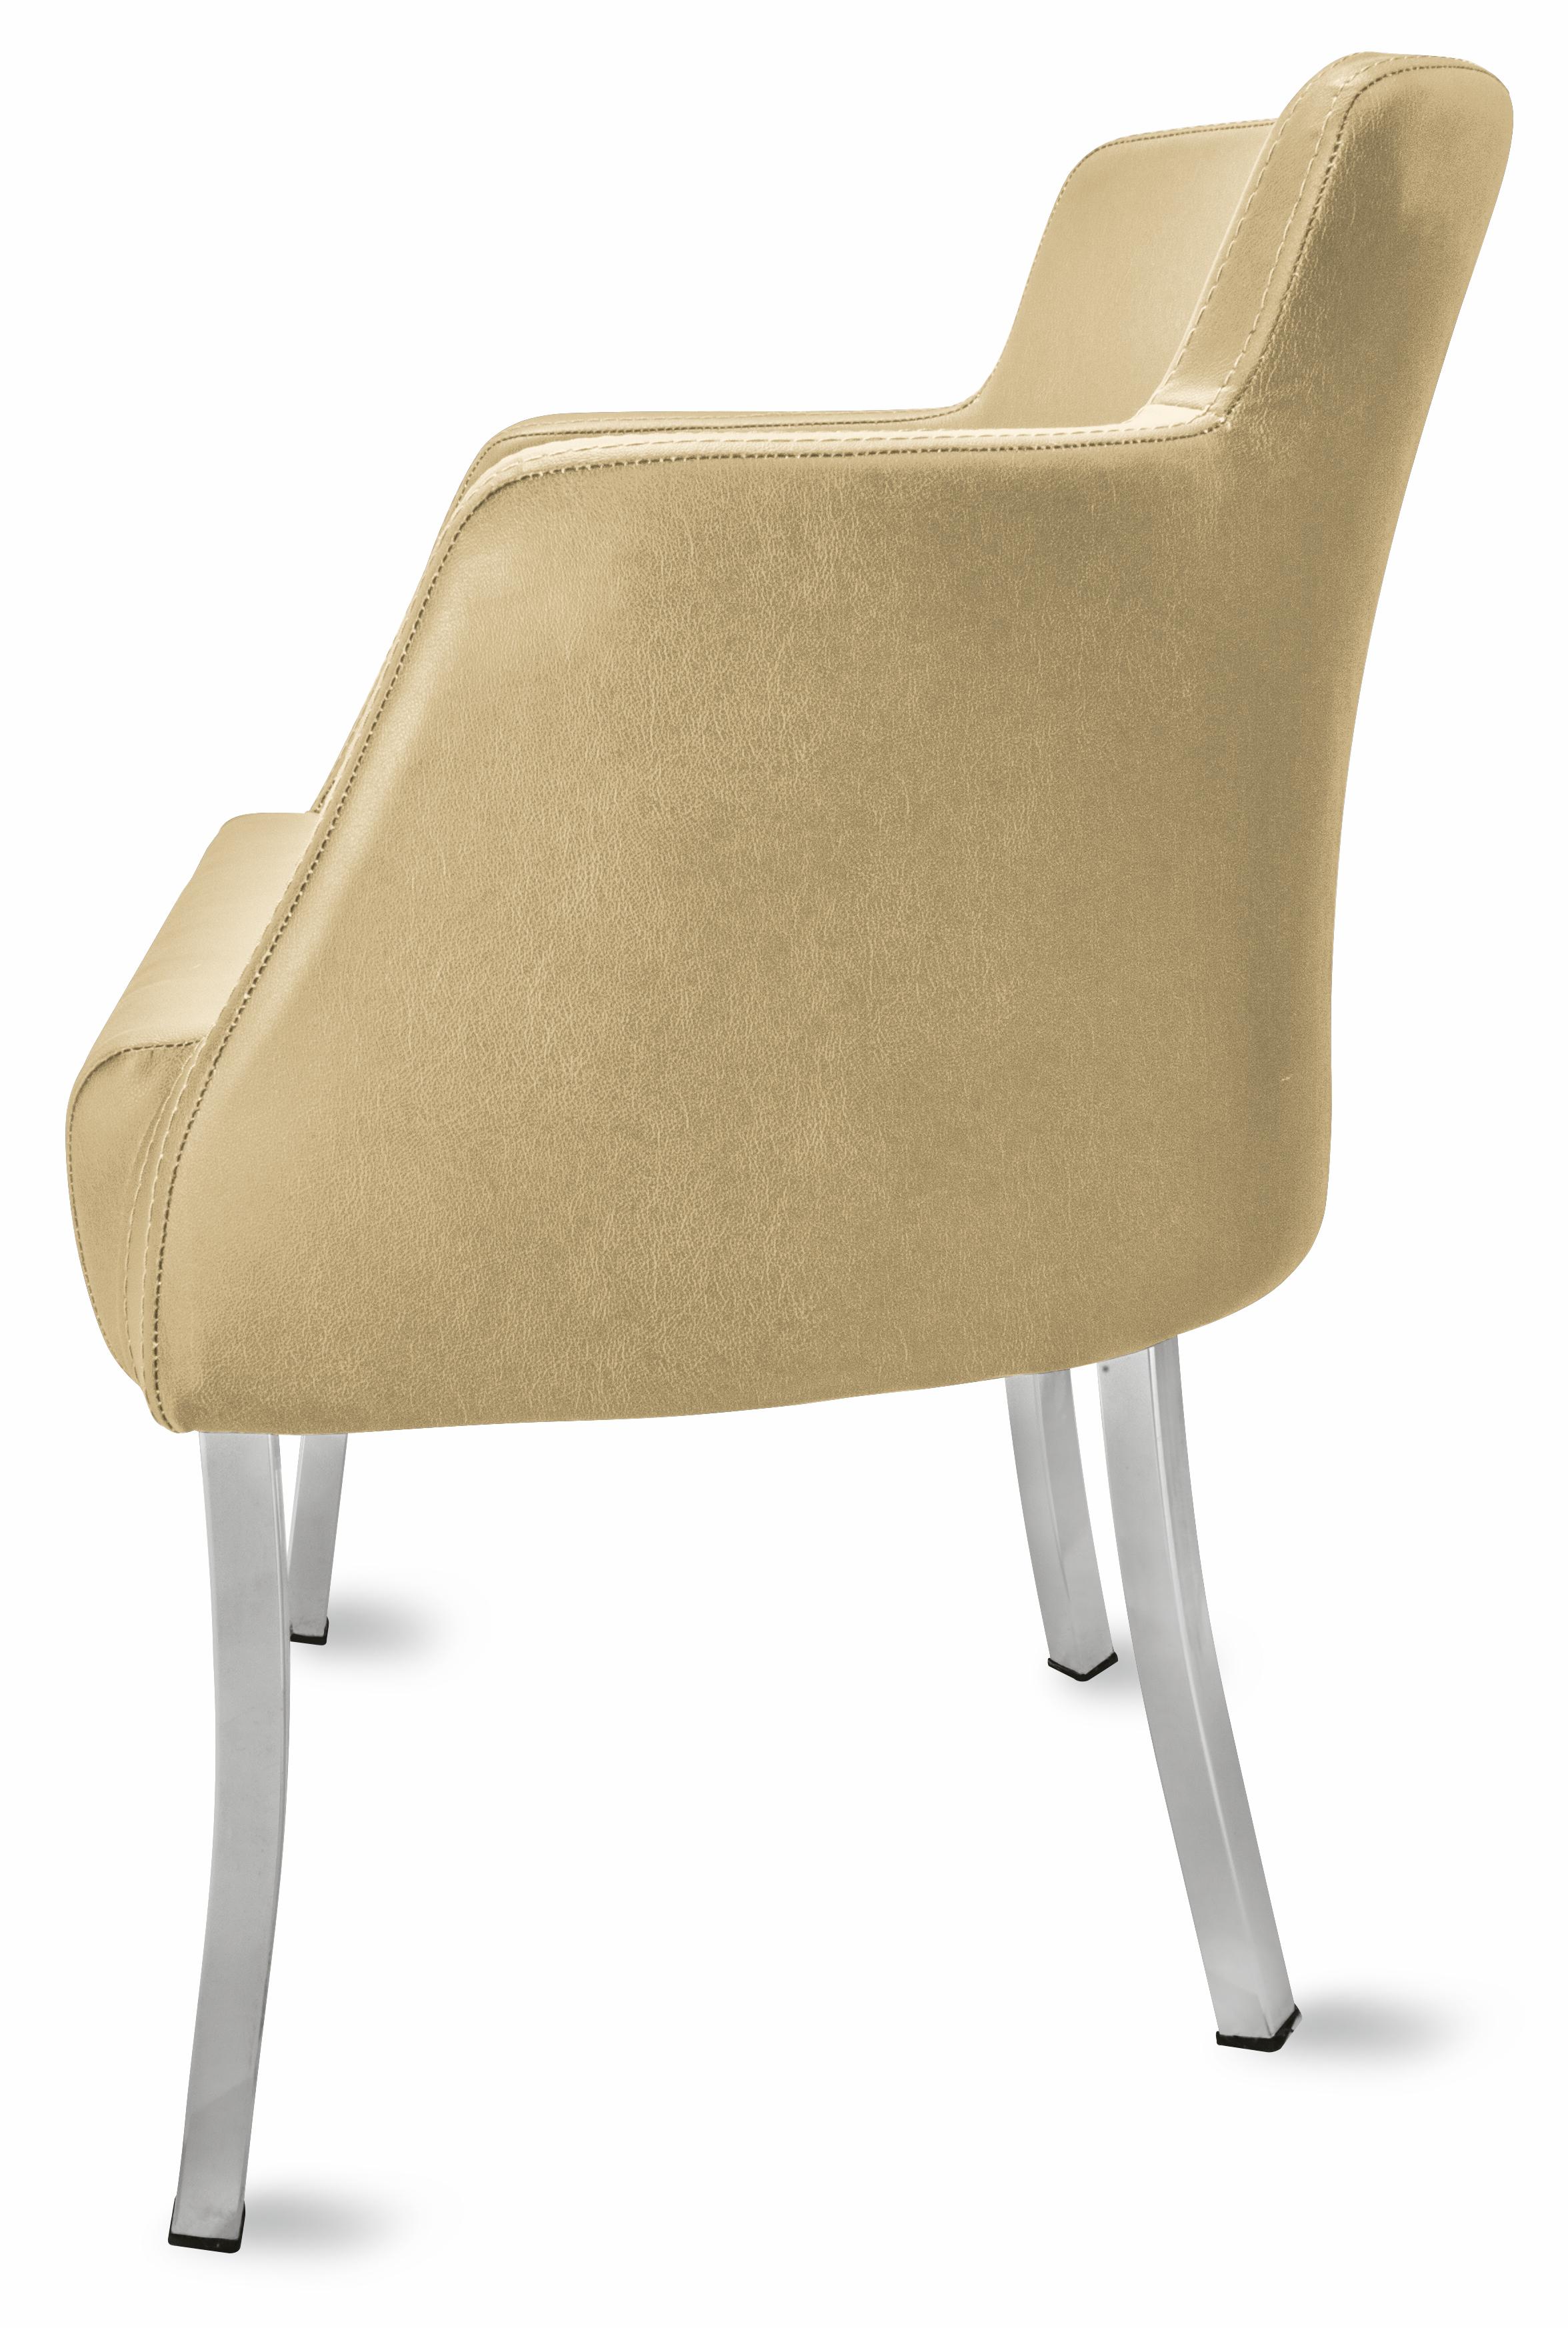 Gastro stuhl sessel primo beige g nstig kaufen m bel star for Sessel stuhl